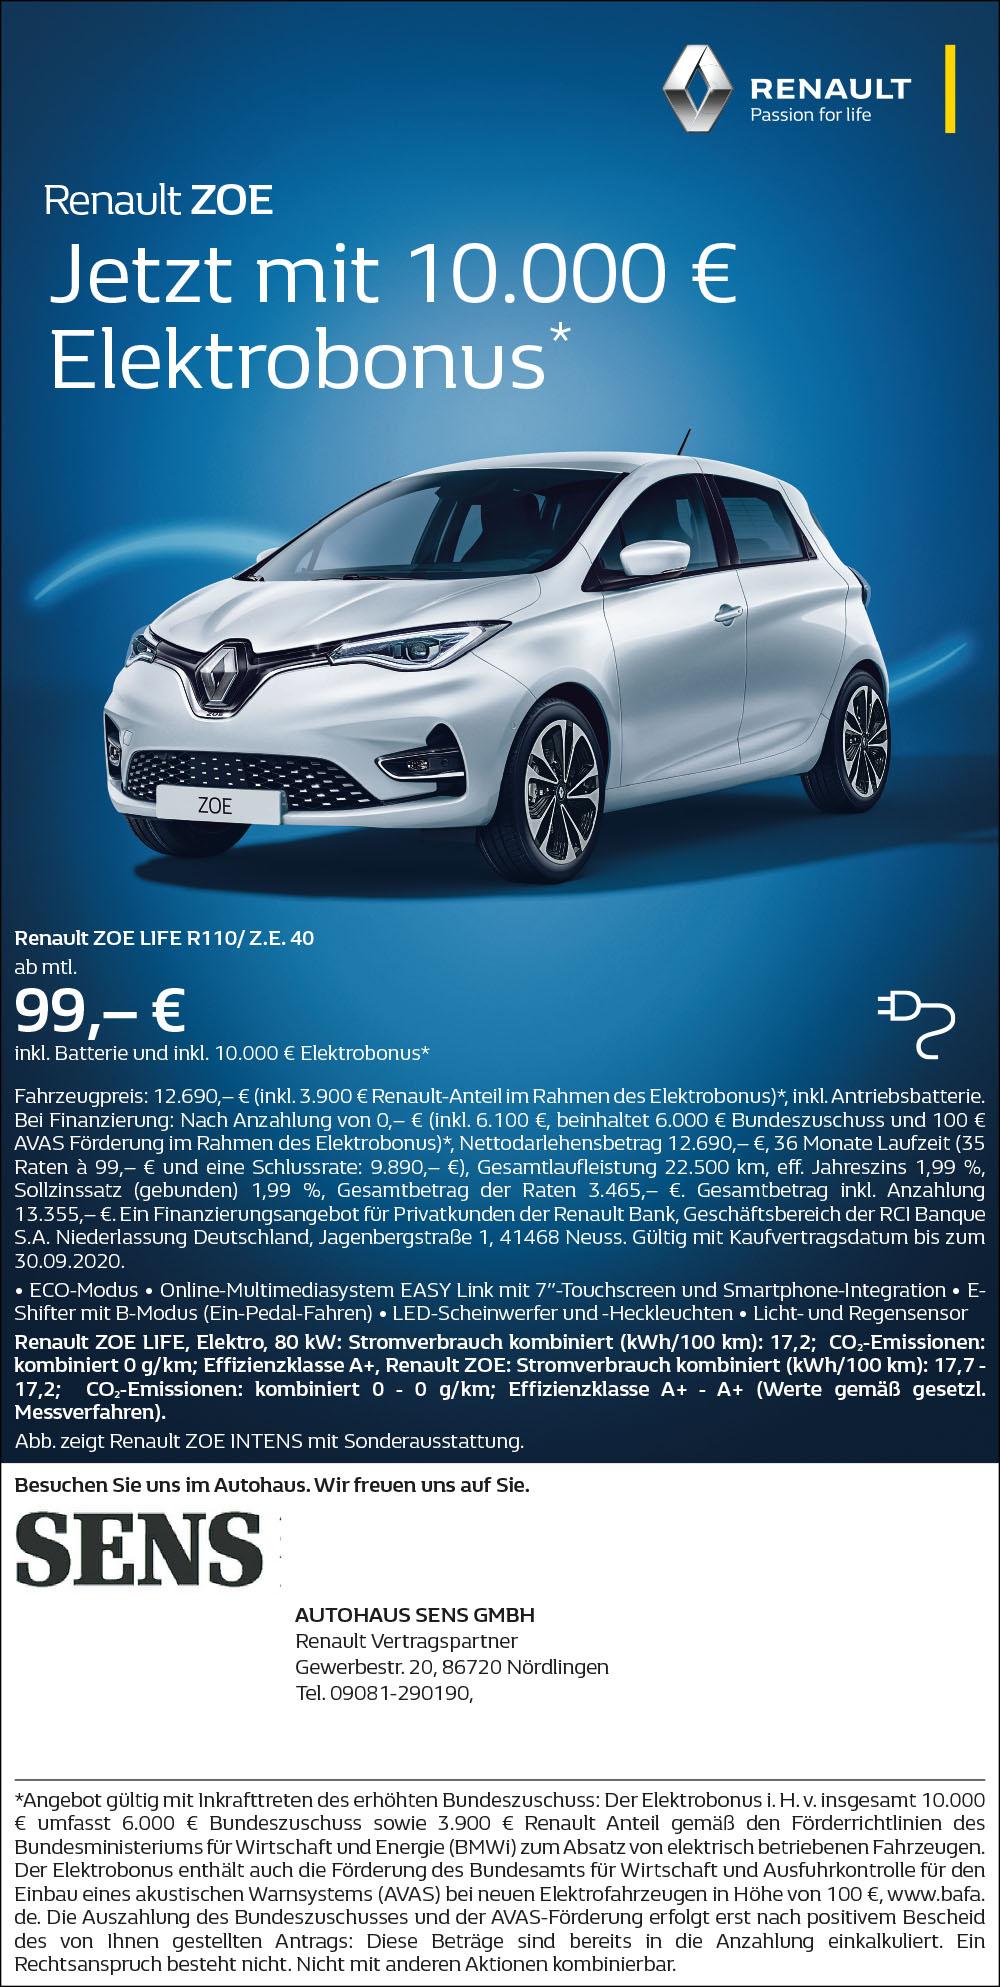 Renault ZOE – Jetzt mit 10.000 € Elektrobonus